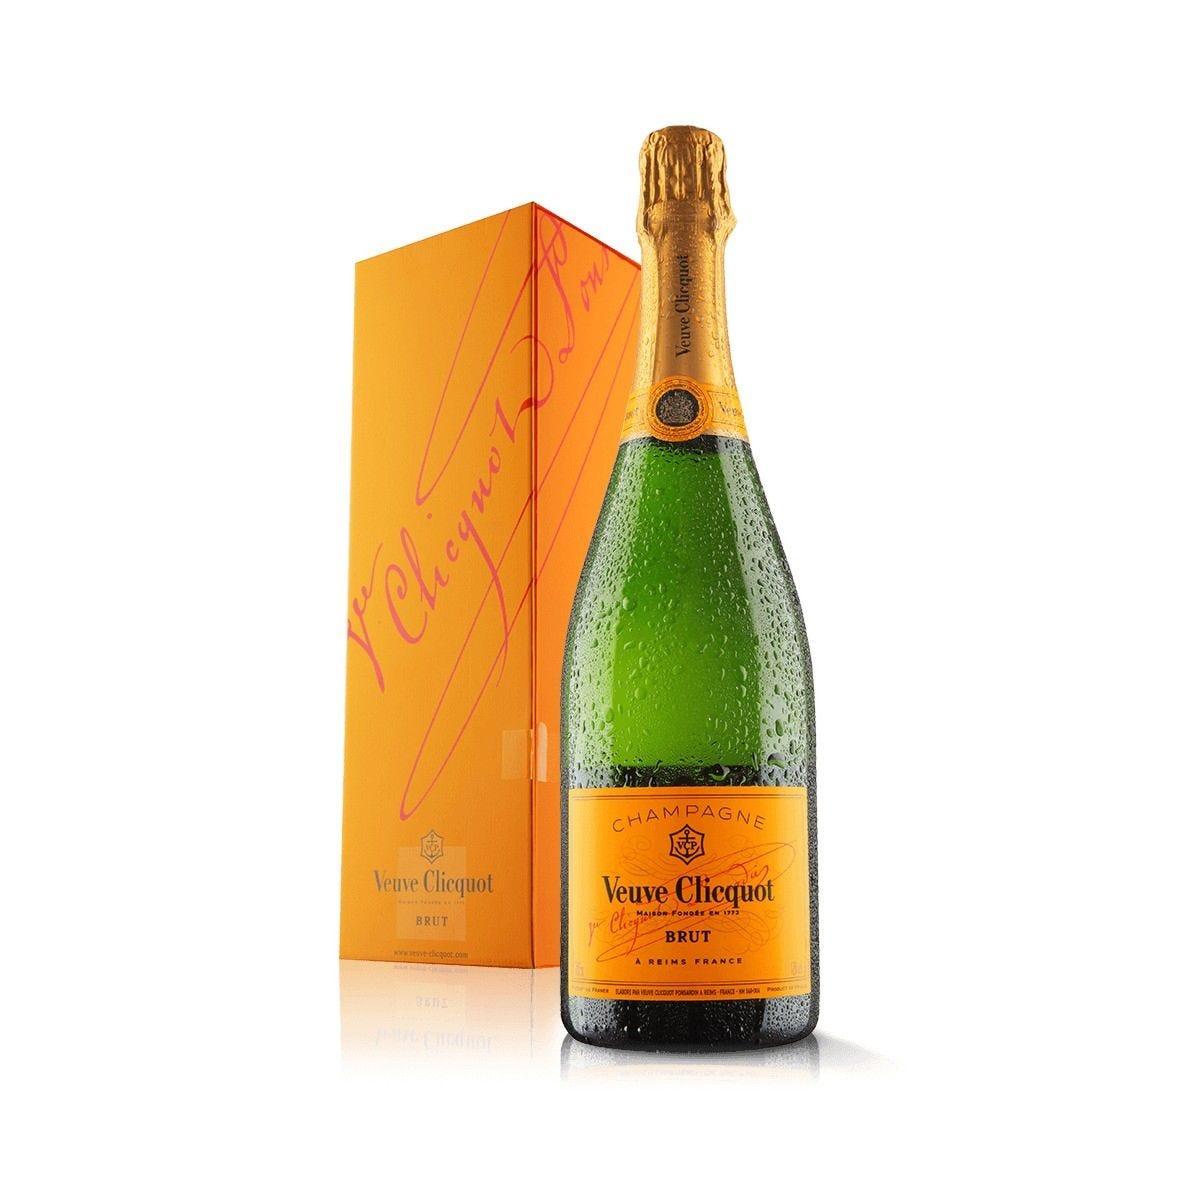 Virgin Wines Champagne Veuve Clicquot